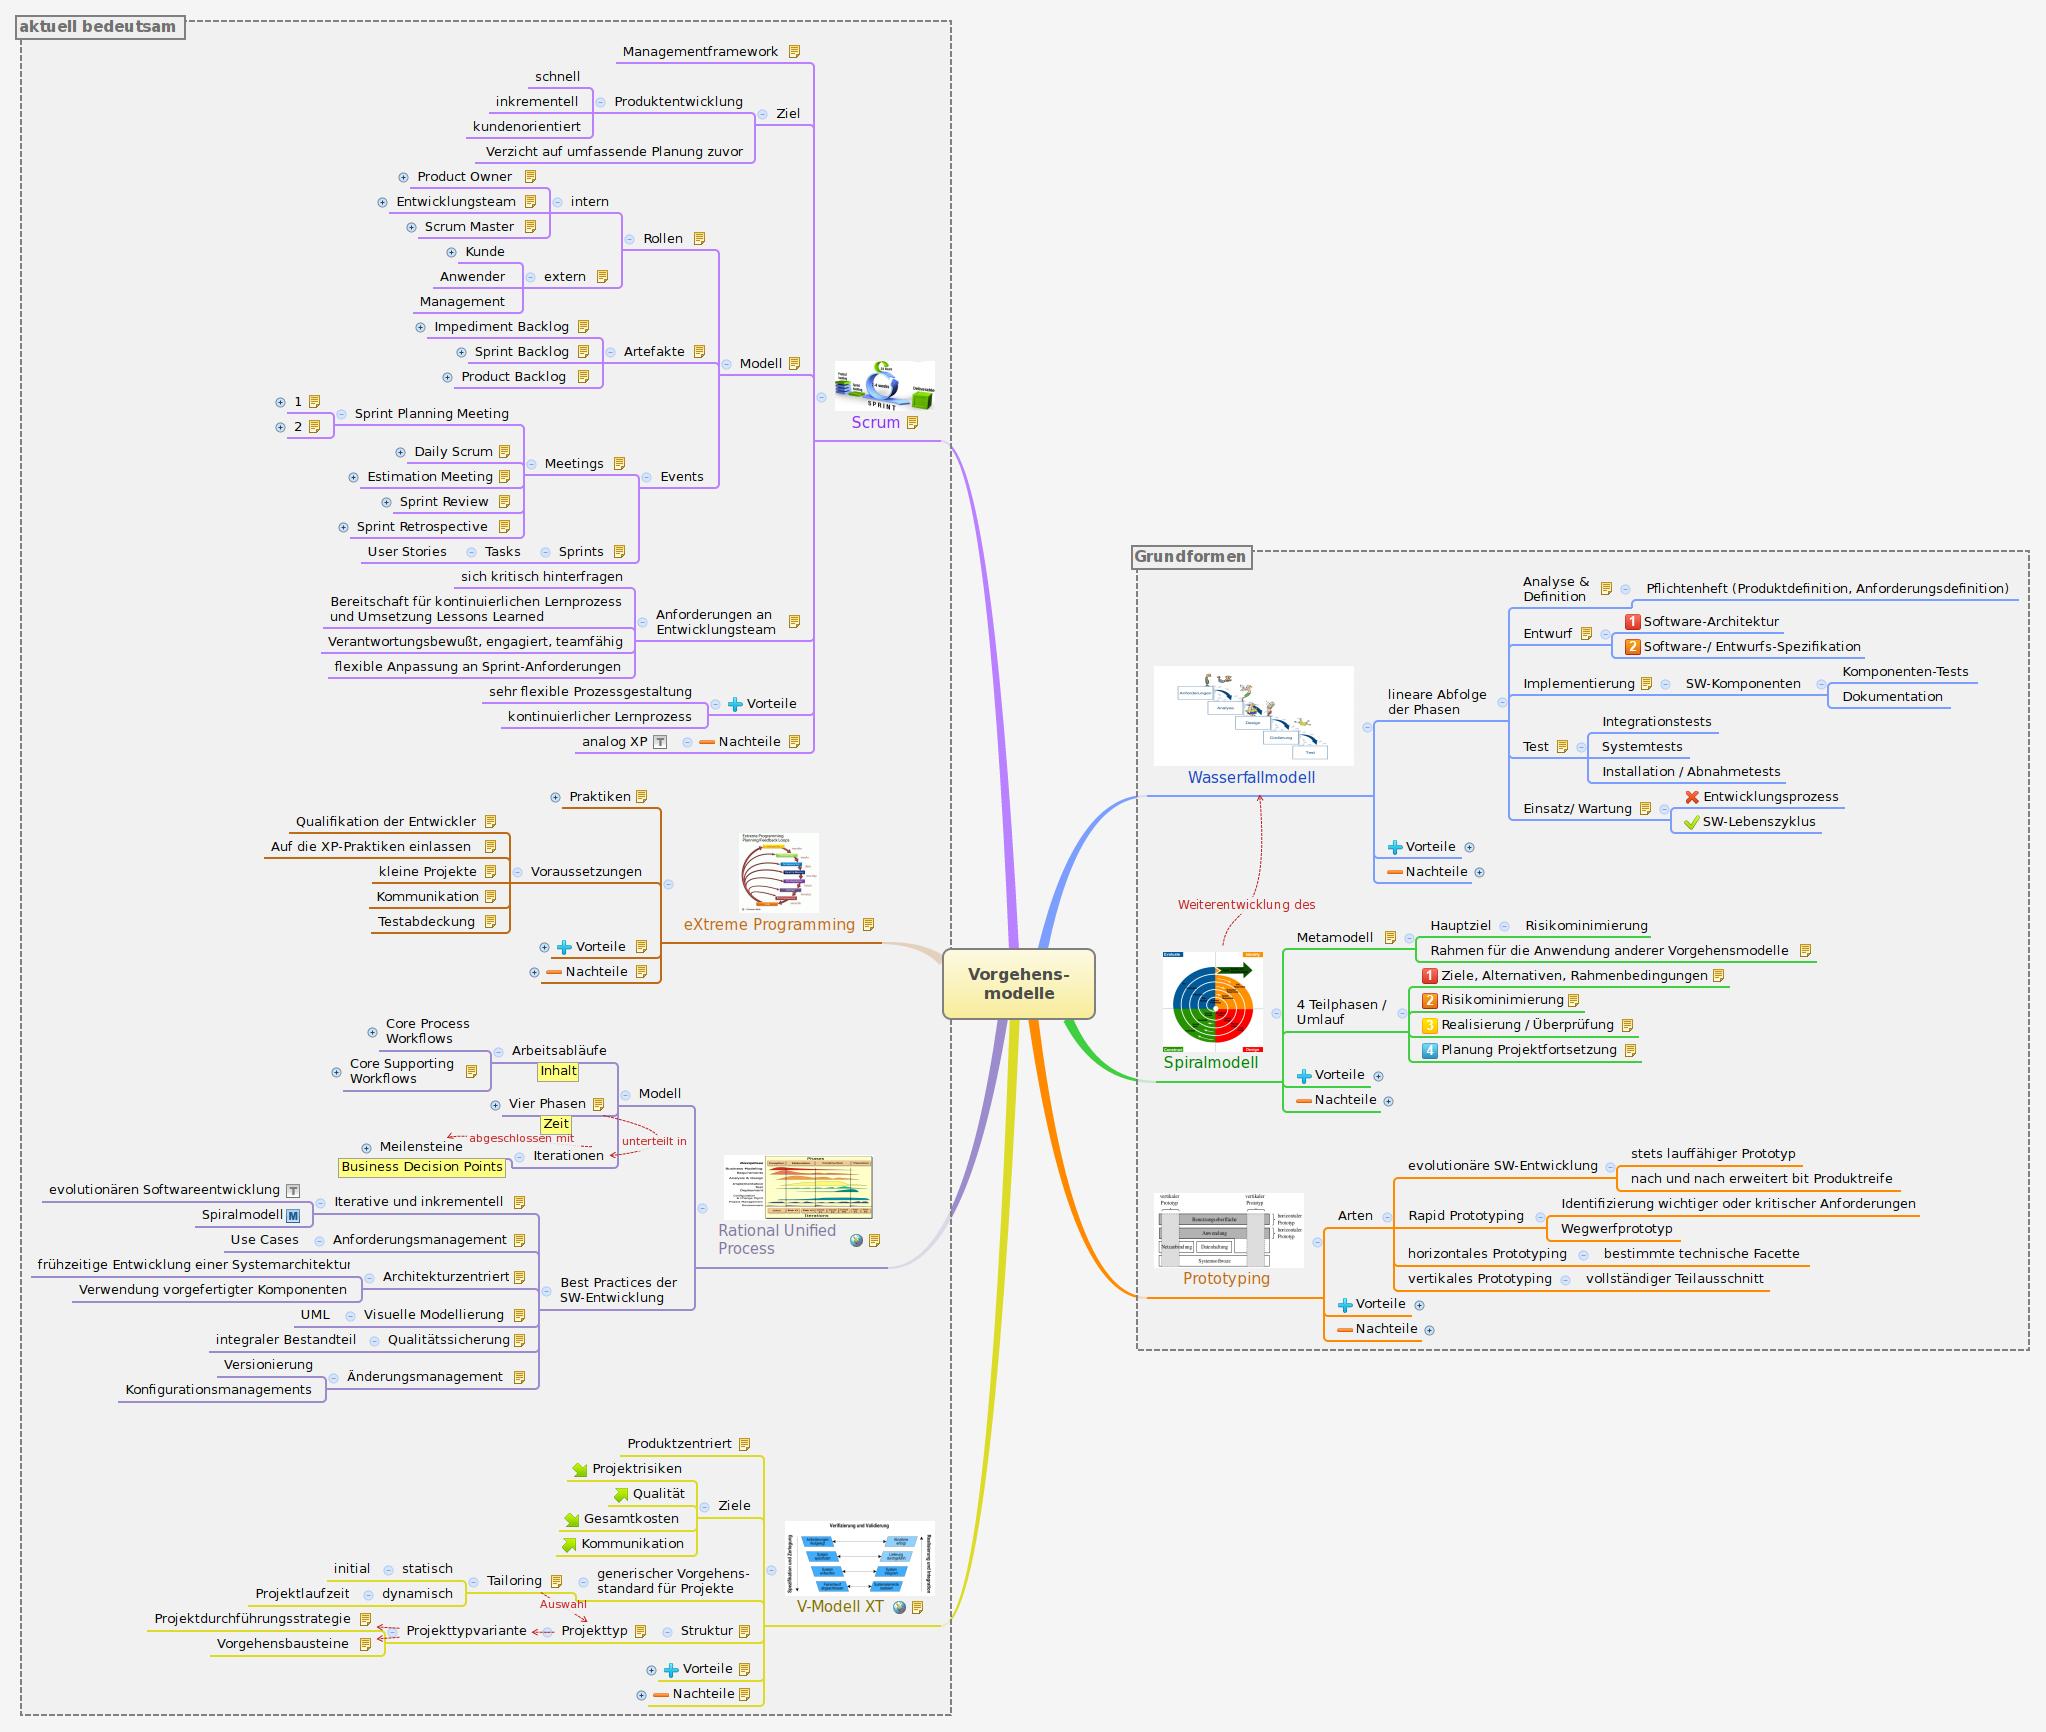 Vorgehens-modelle -- XMind Online Library